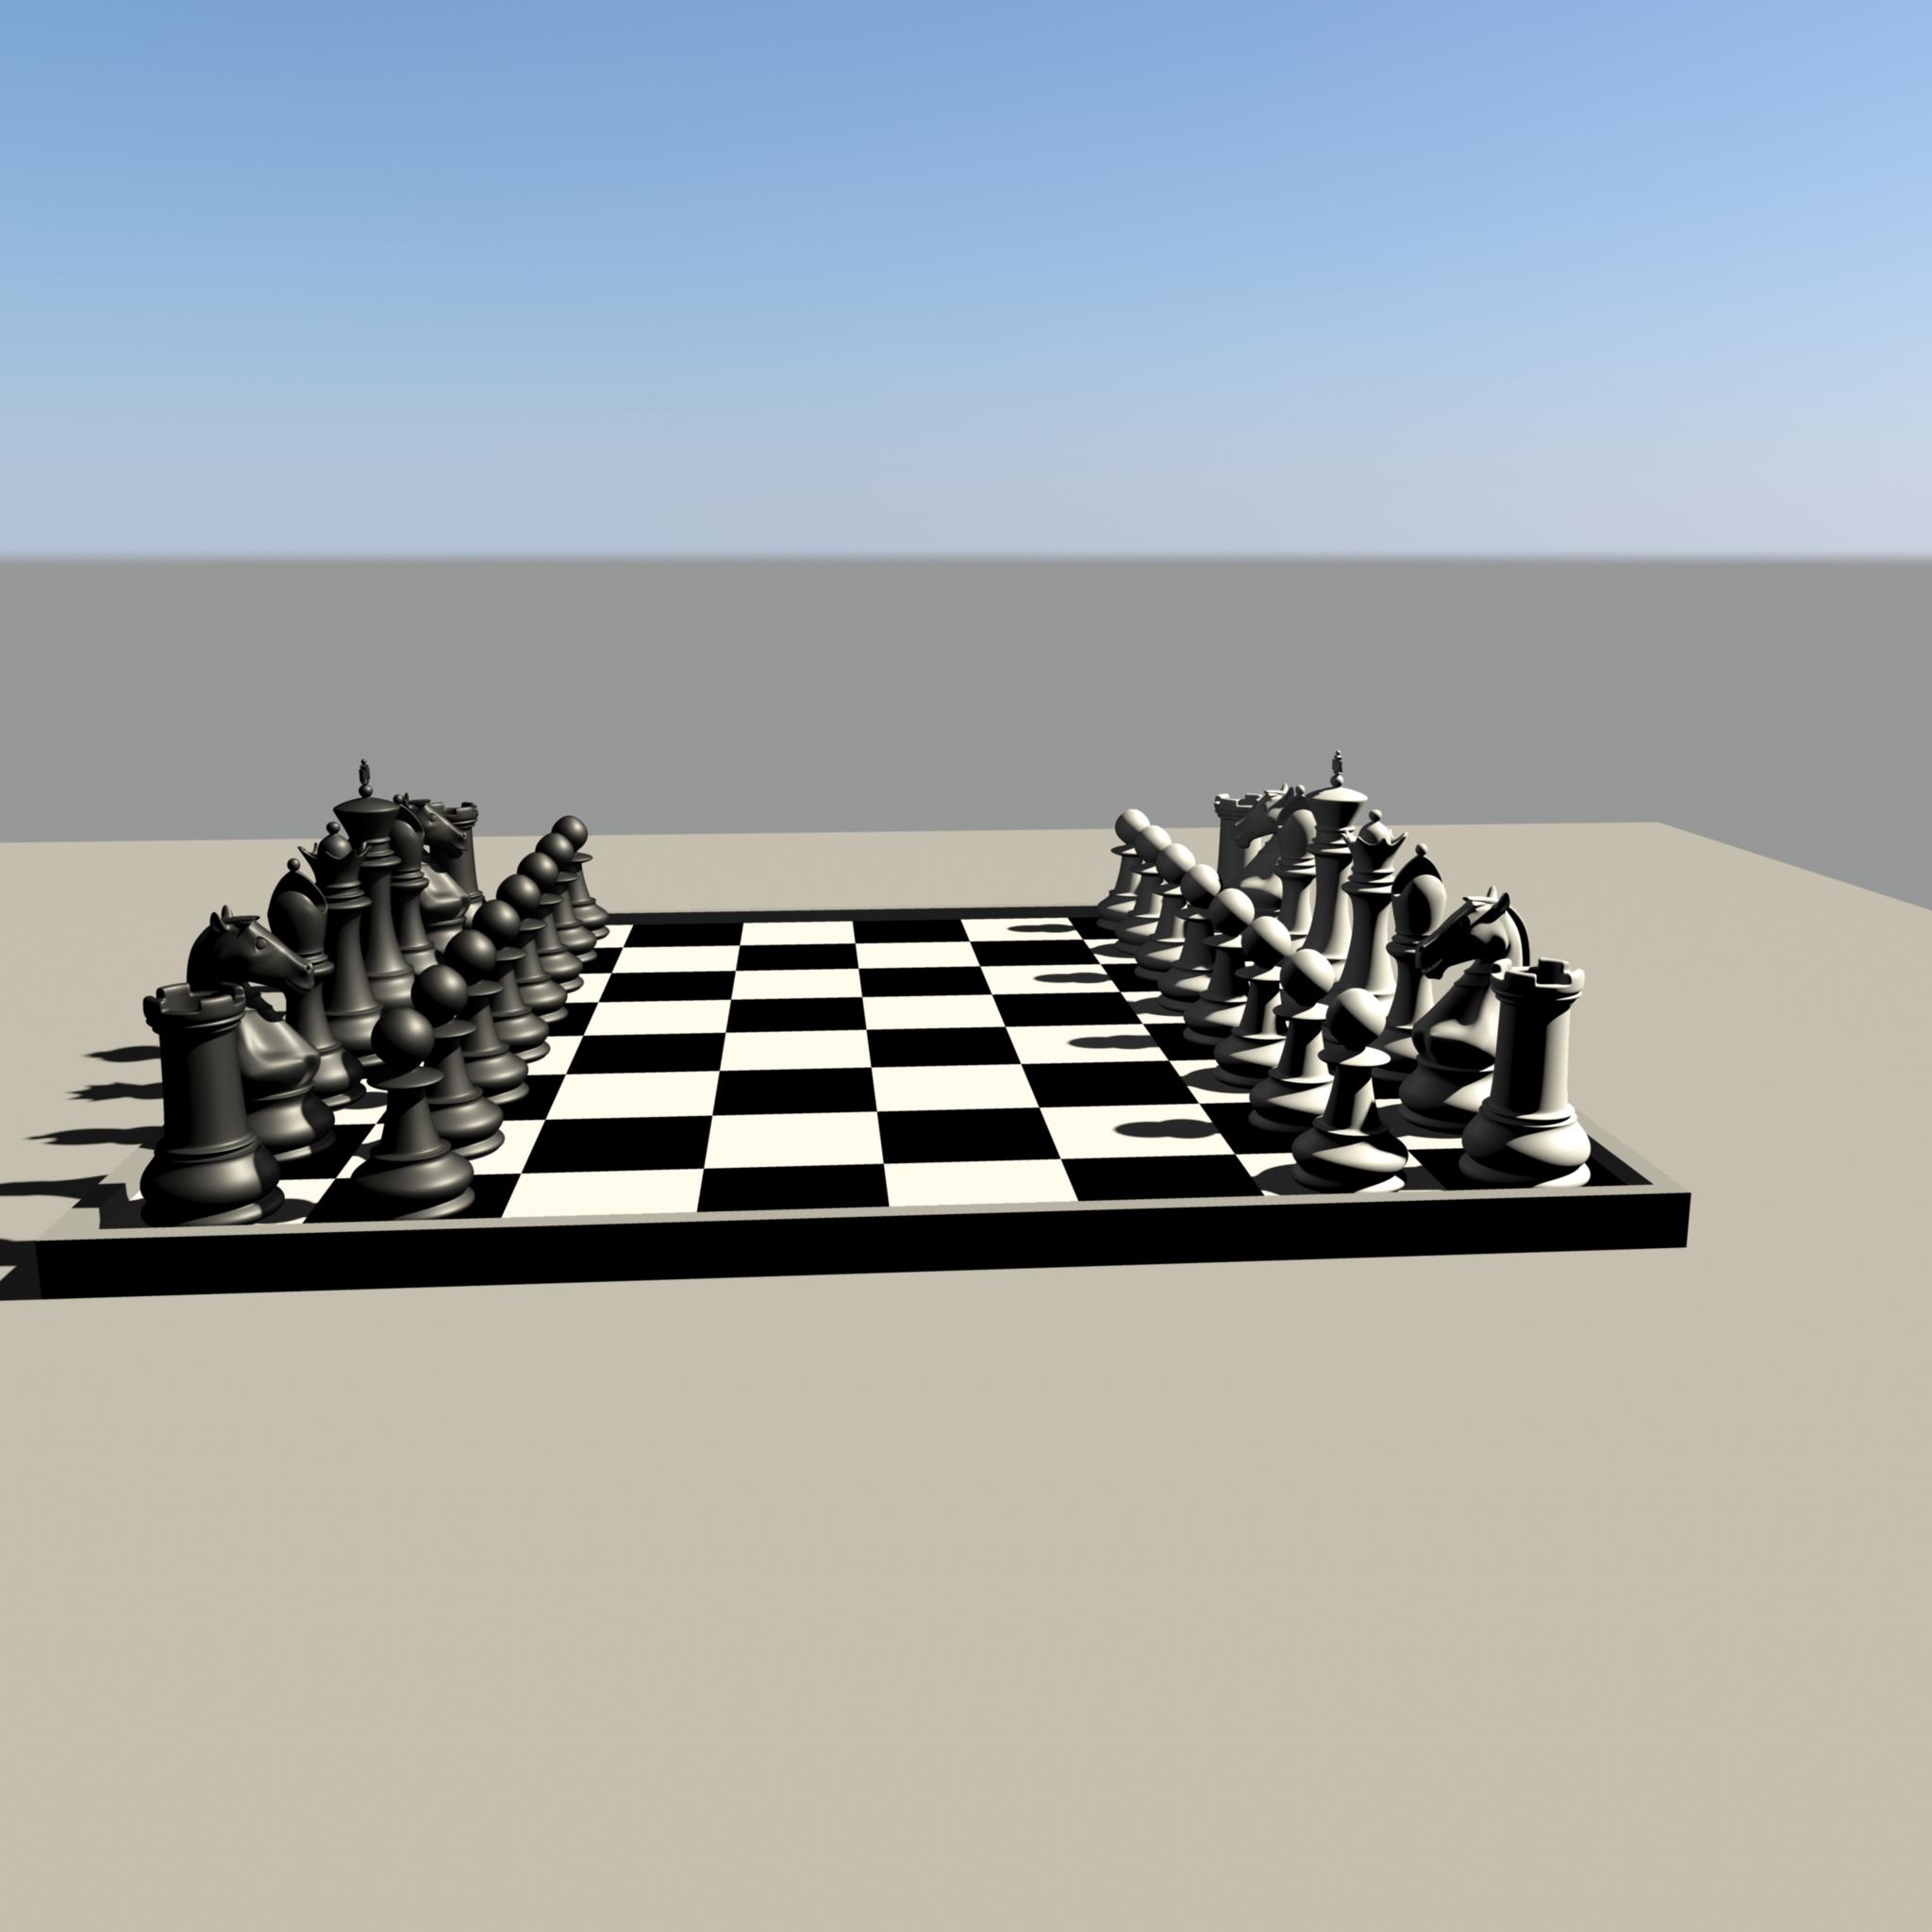 chess 3 3d model fbx ma mb obj 153545